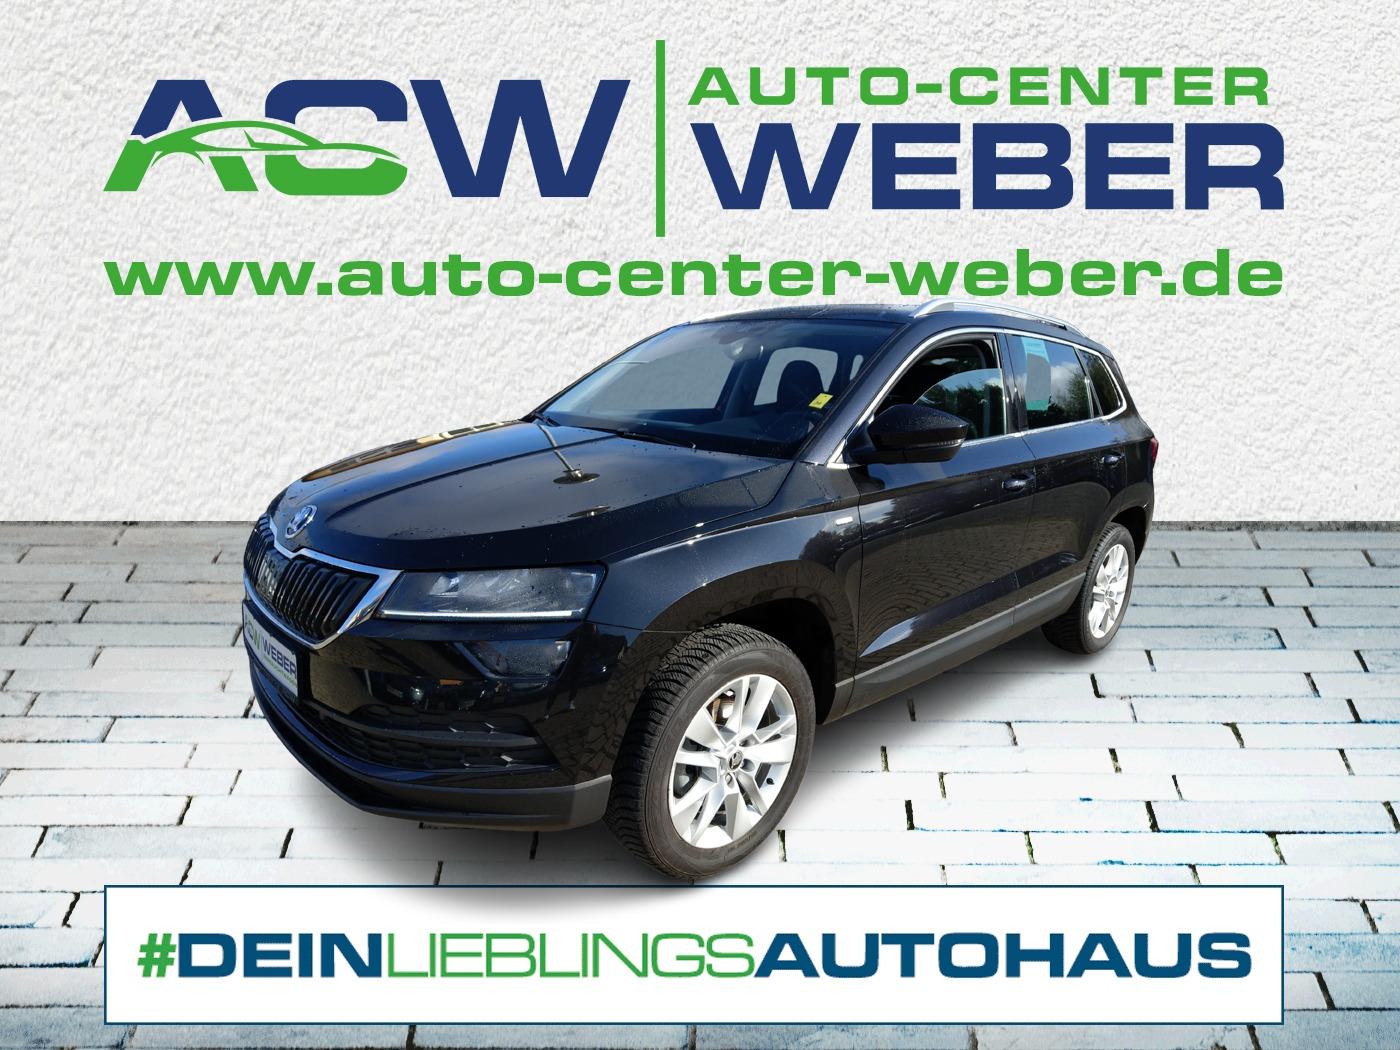 Skoda Karoq 1.5 TSI Drive 125 BEST OF DSG & Servicepak, Jahr 2021, Benzin